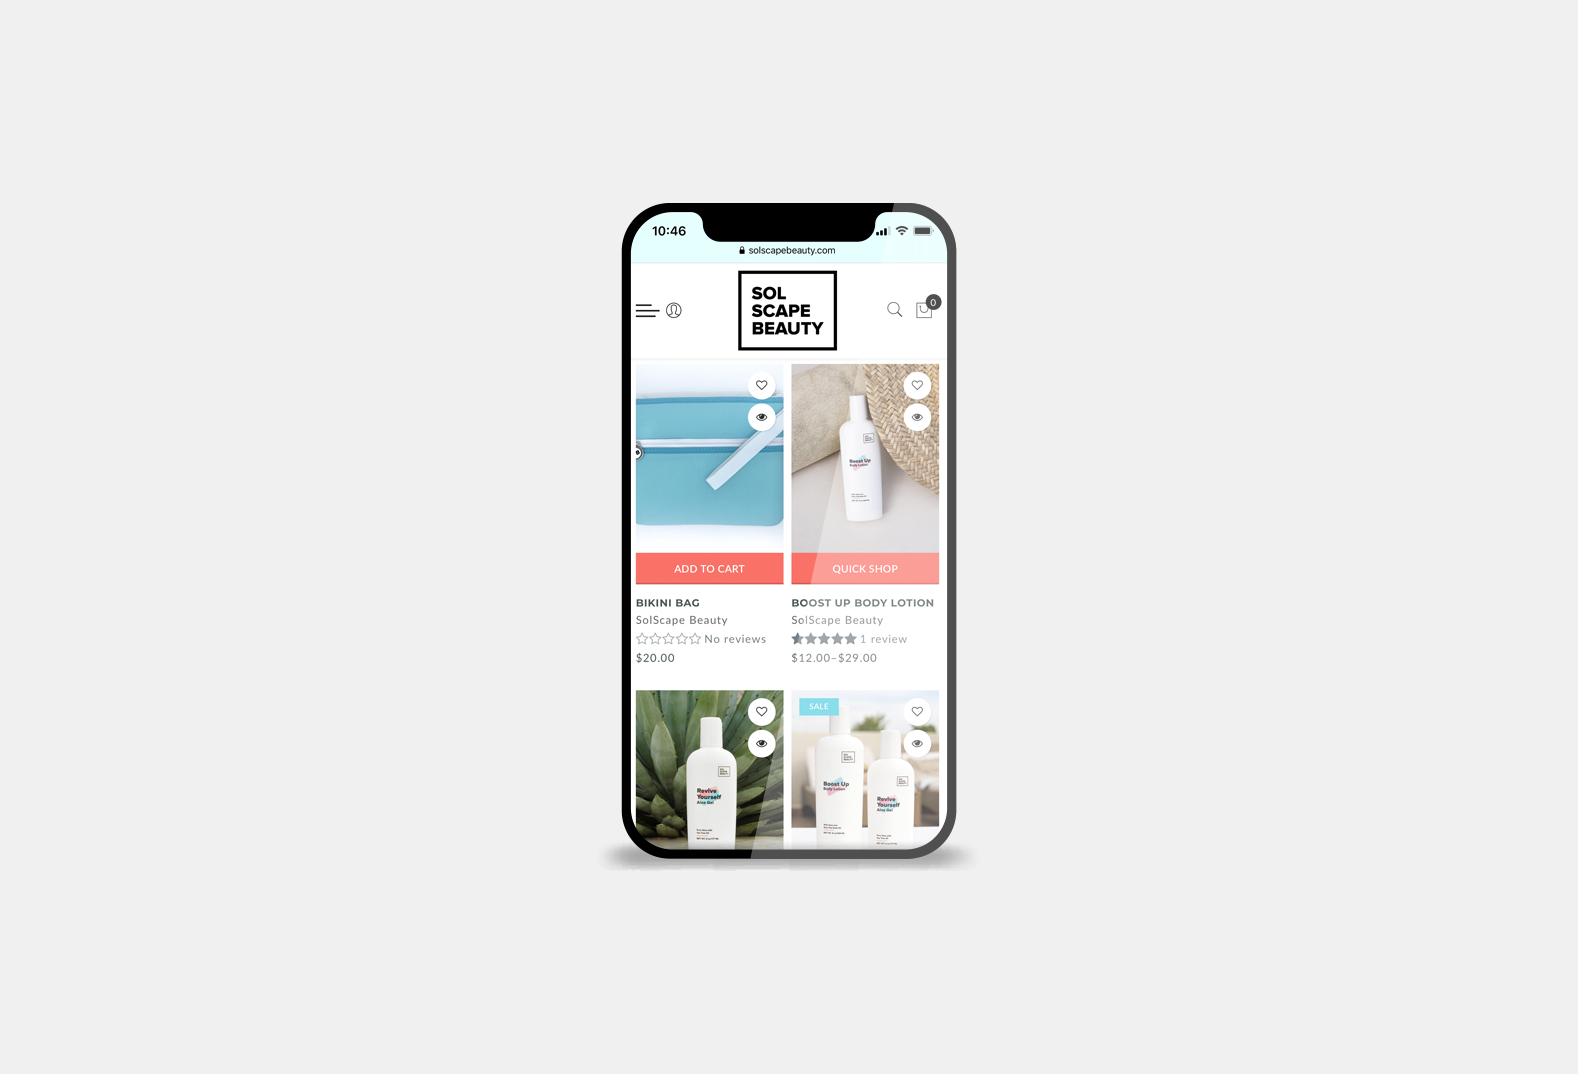 SolScape Beauty Mobile Website Image